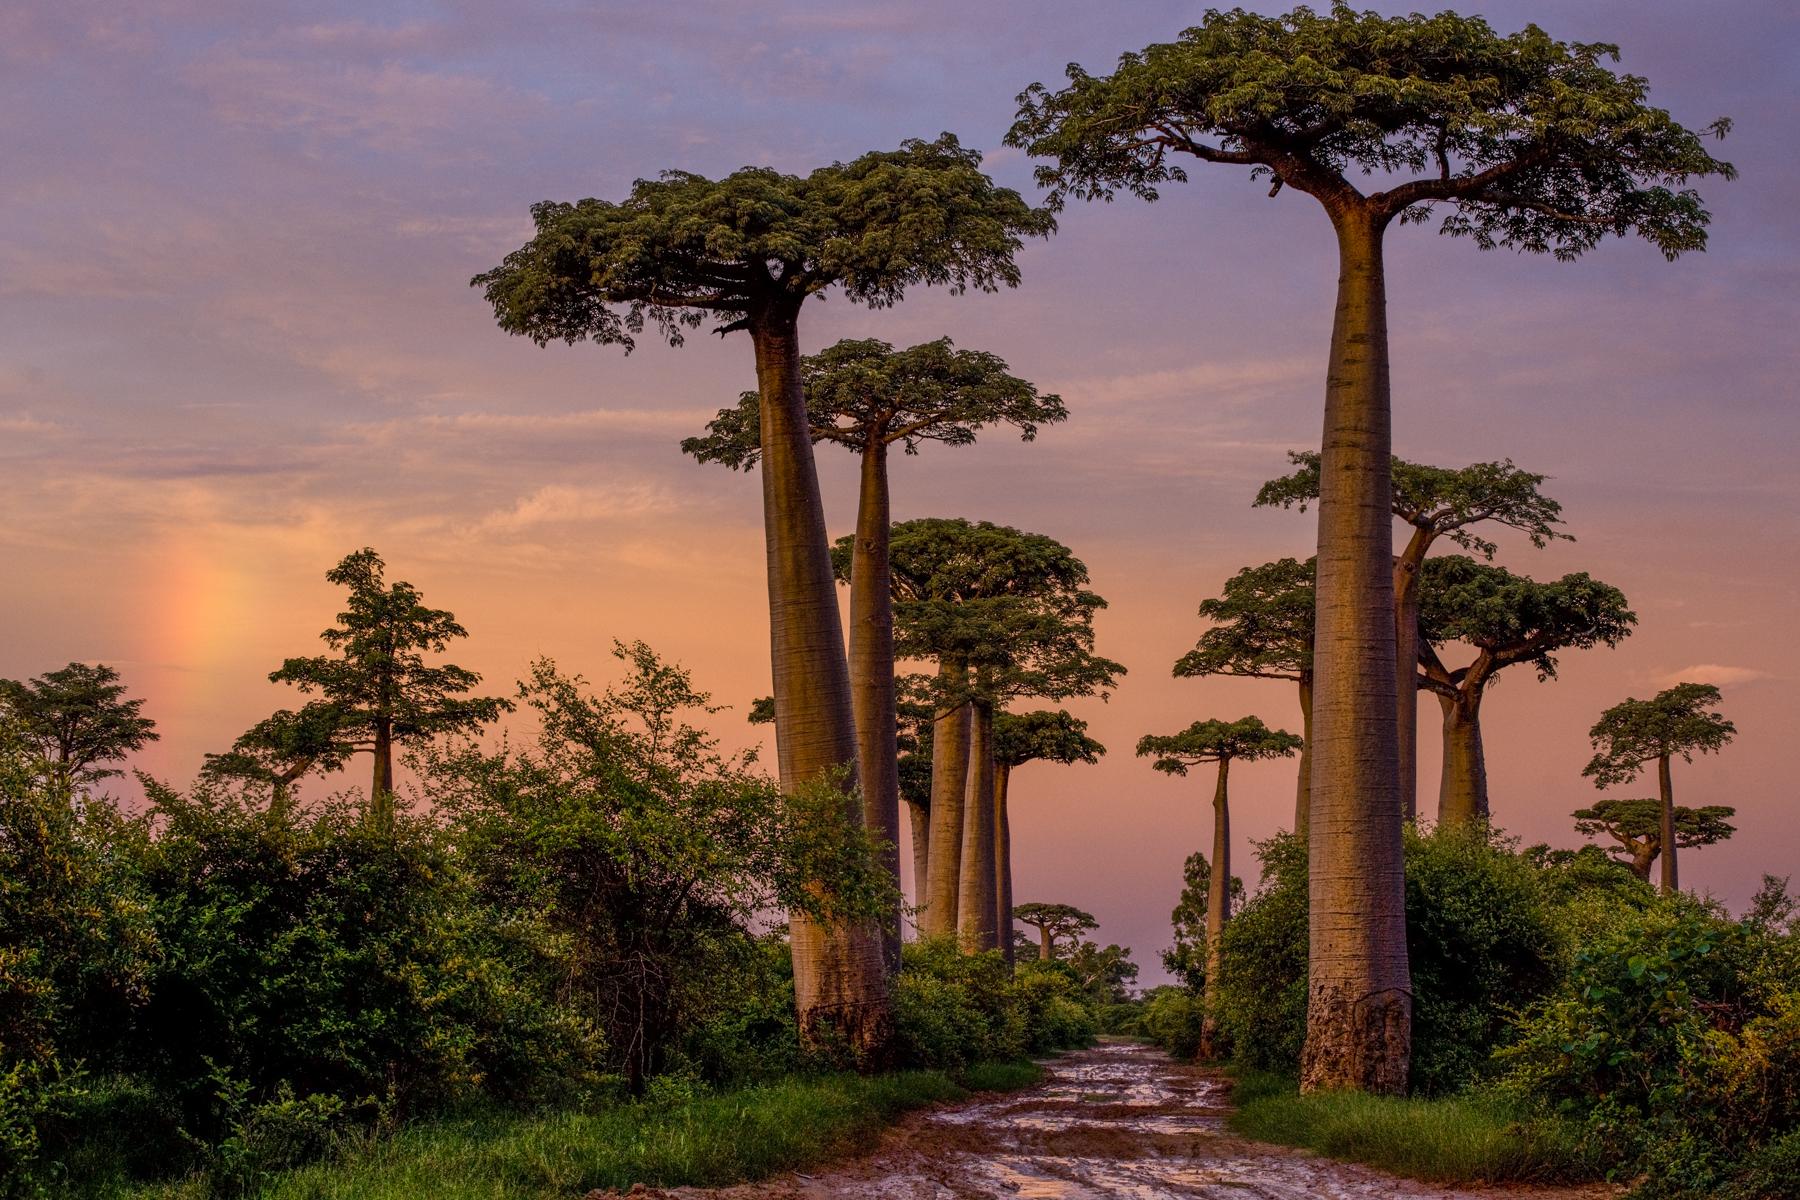 Photograph of Madagascar © Cristina Mittermeier